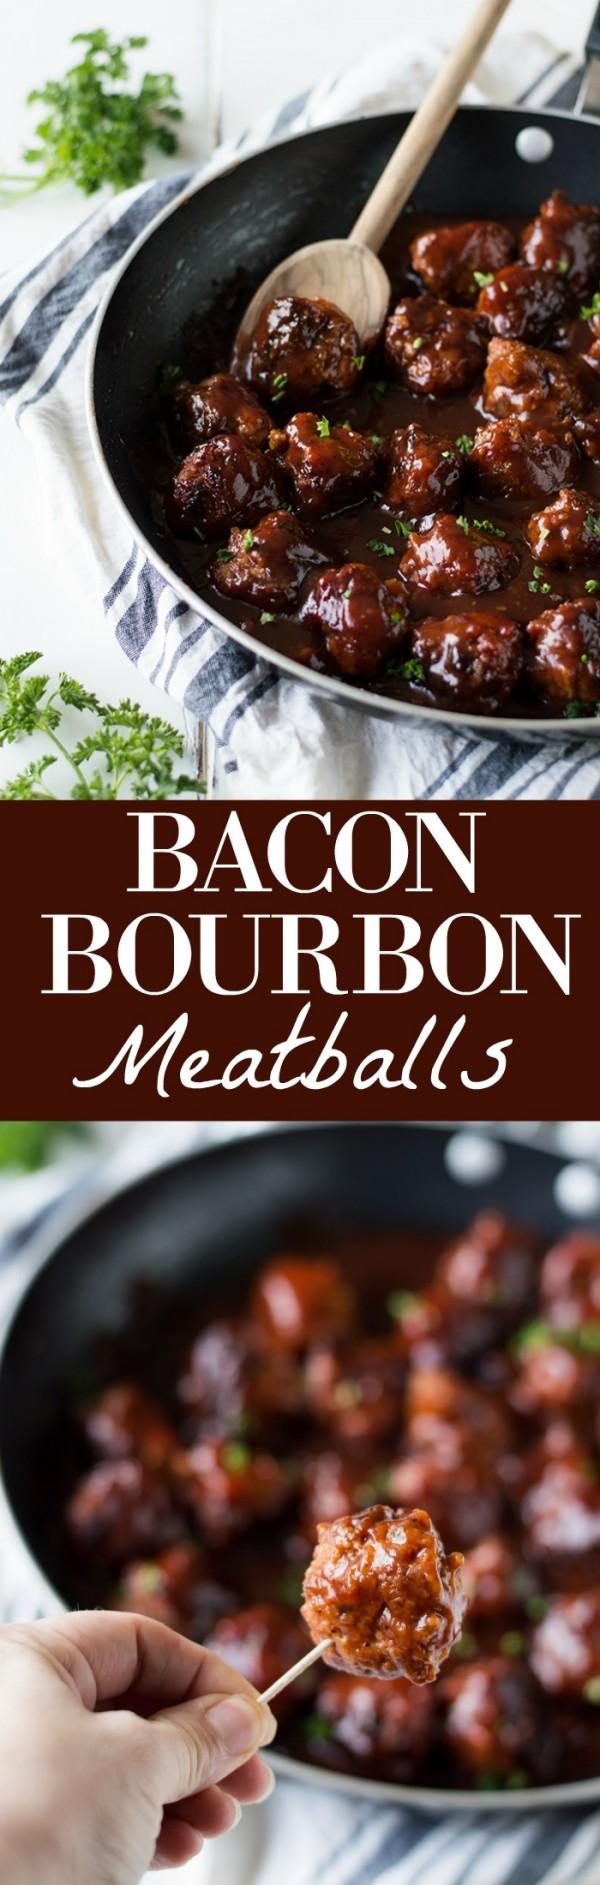 Get the recipe Bacon Bourbon Meatballs @recipes_to_go